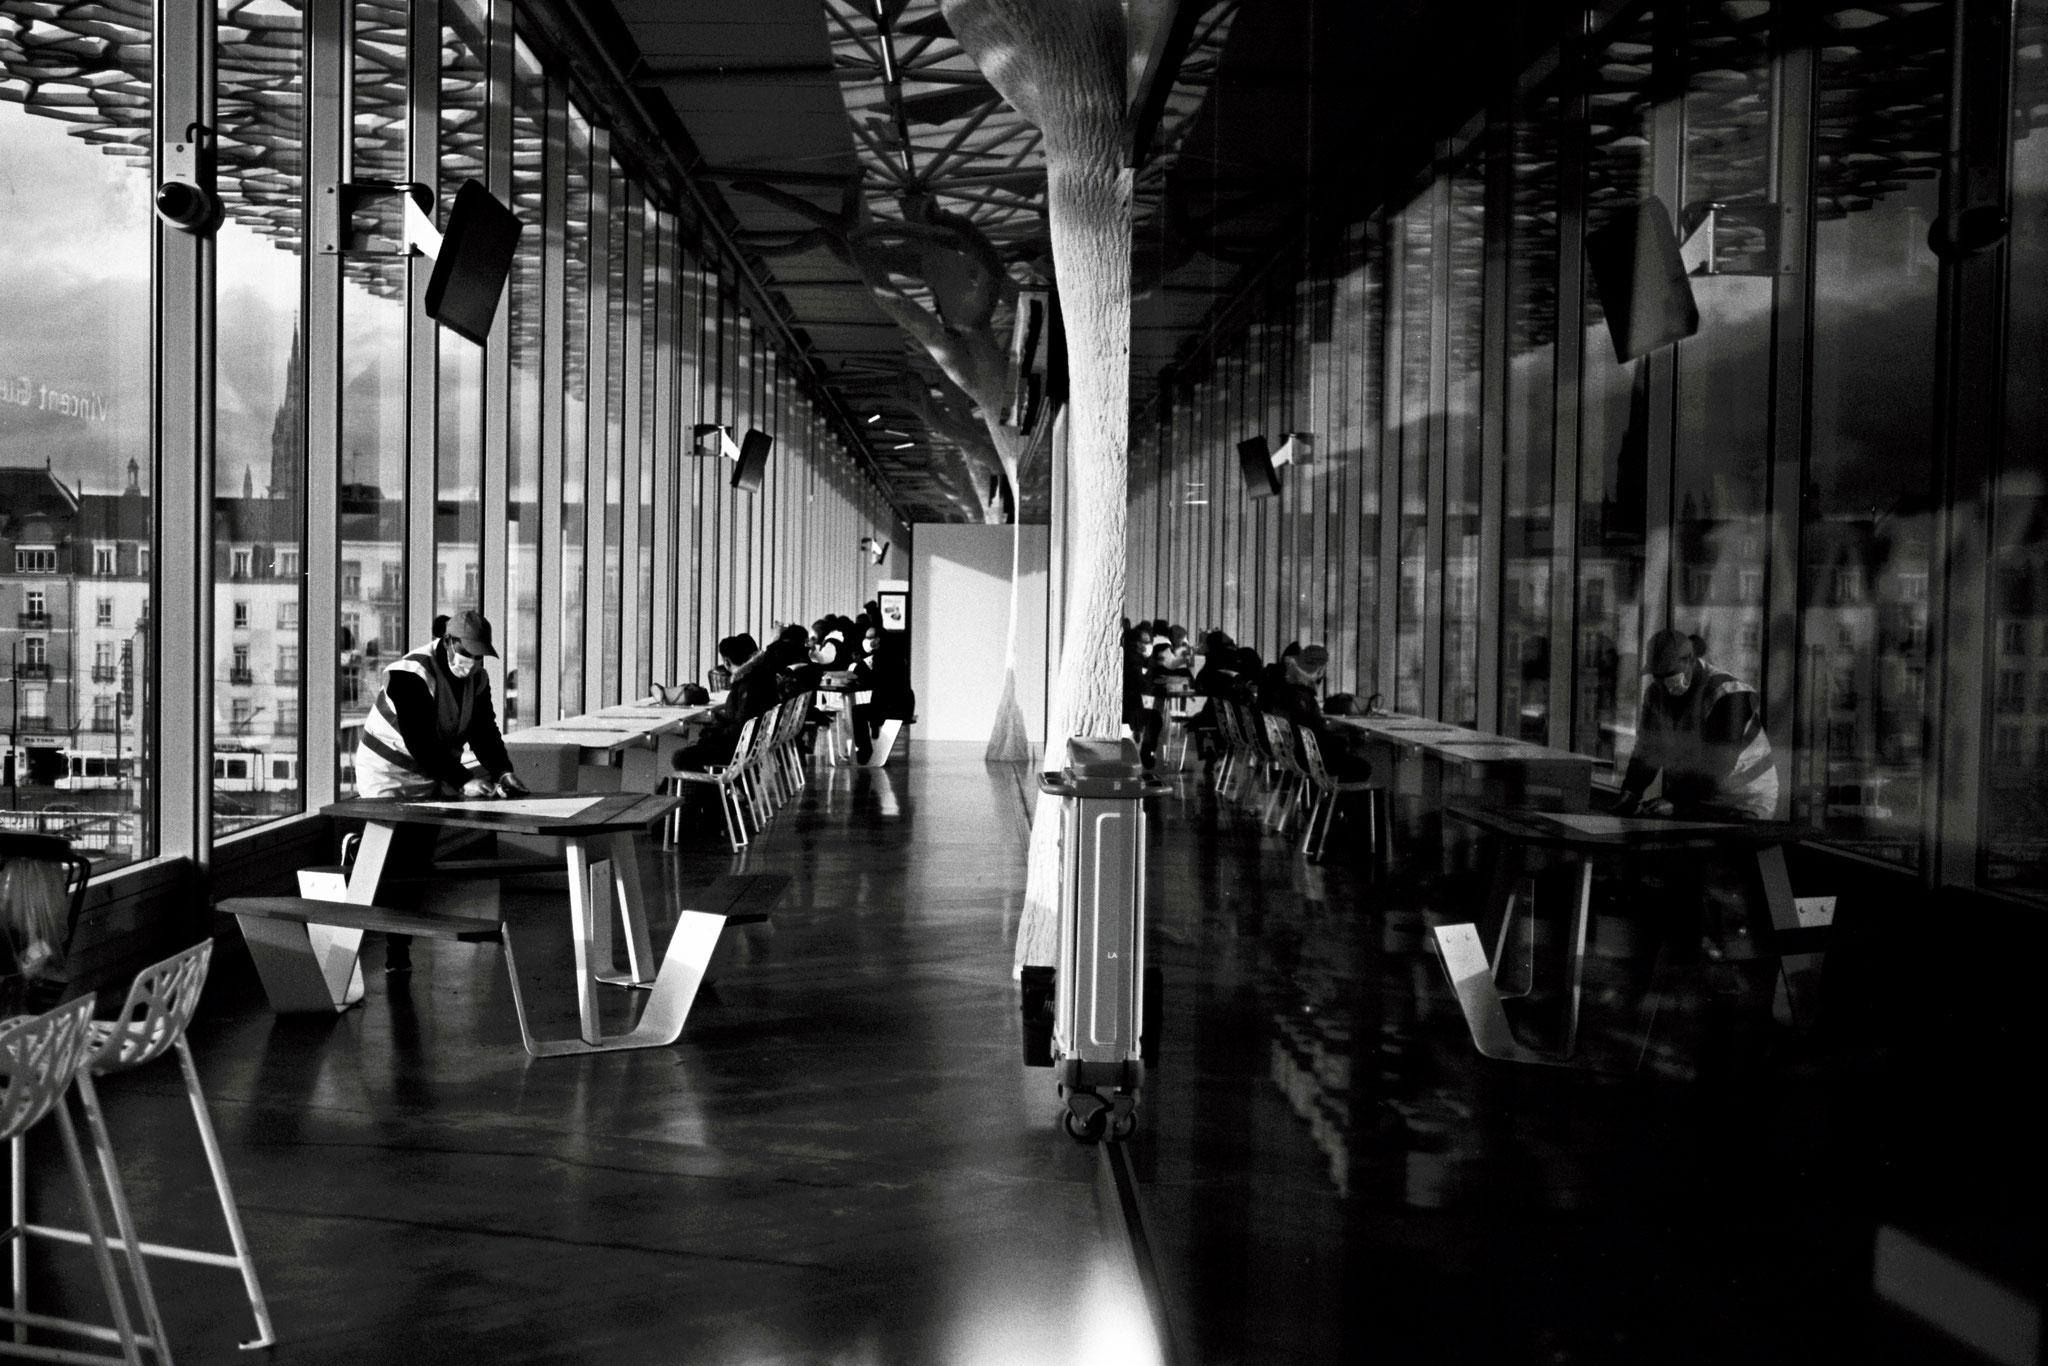 """Work vs break"" - Gare de Nantes (2021). Rollei Blackbird Creative 64 ASA. © Clémence Rougetet"